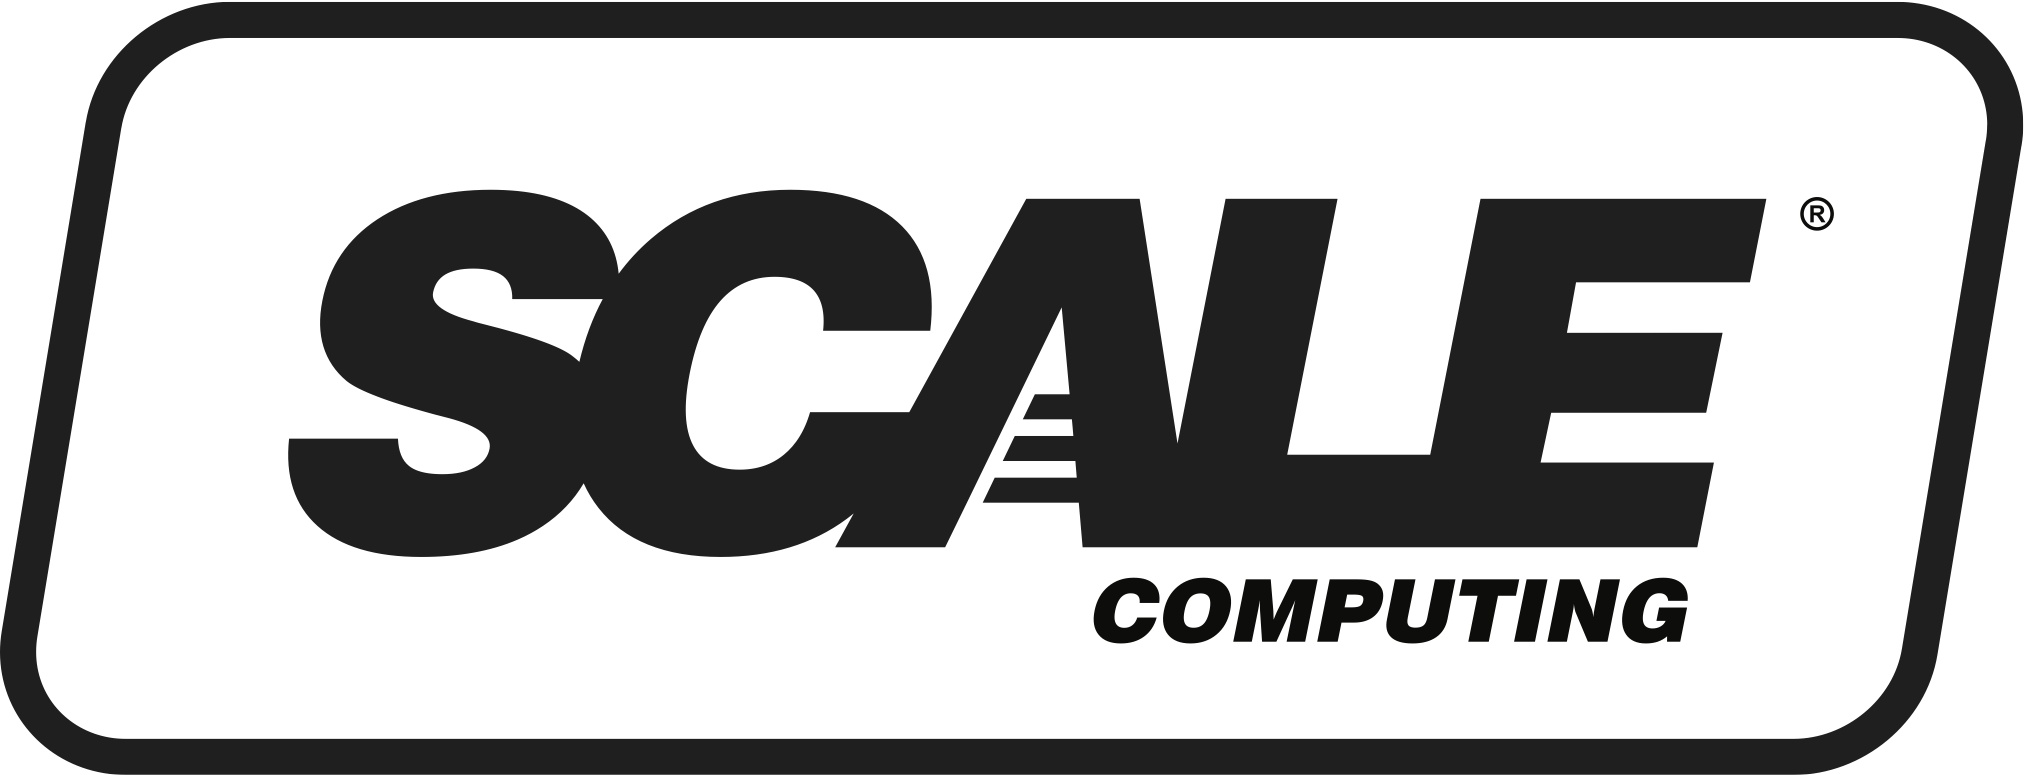 ScaleDigital_logo